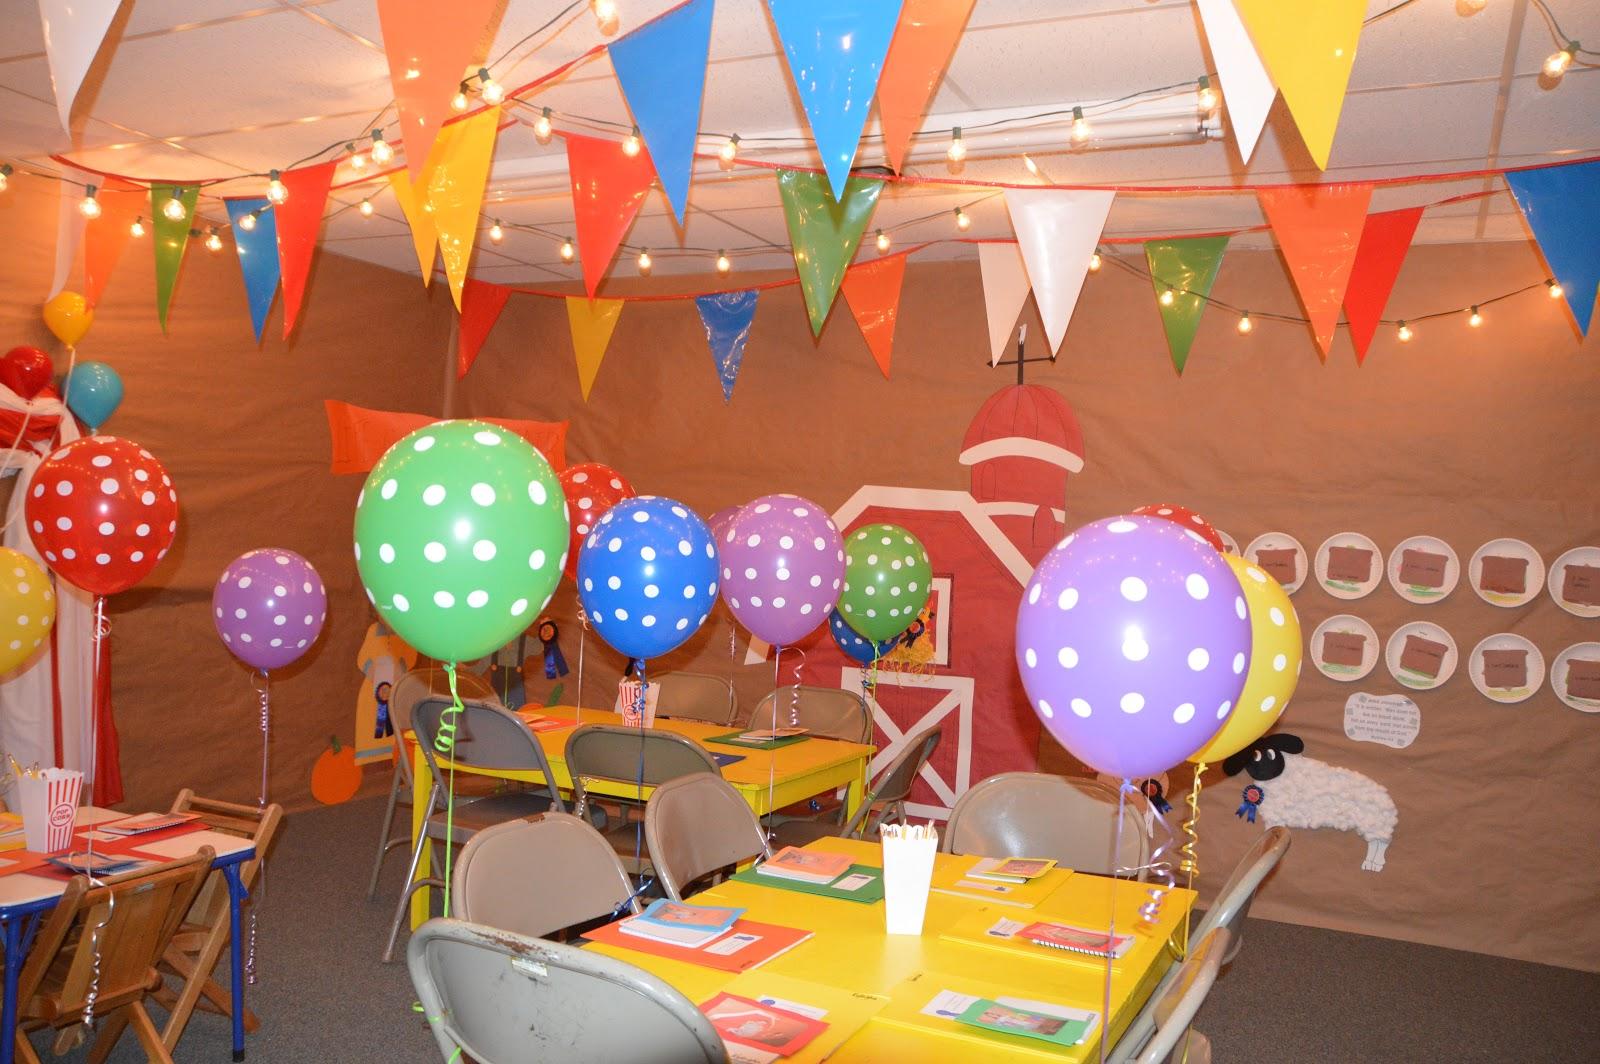 open house decorating ideas – decoration image idea